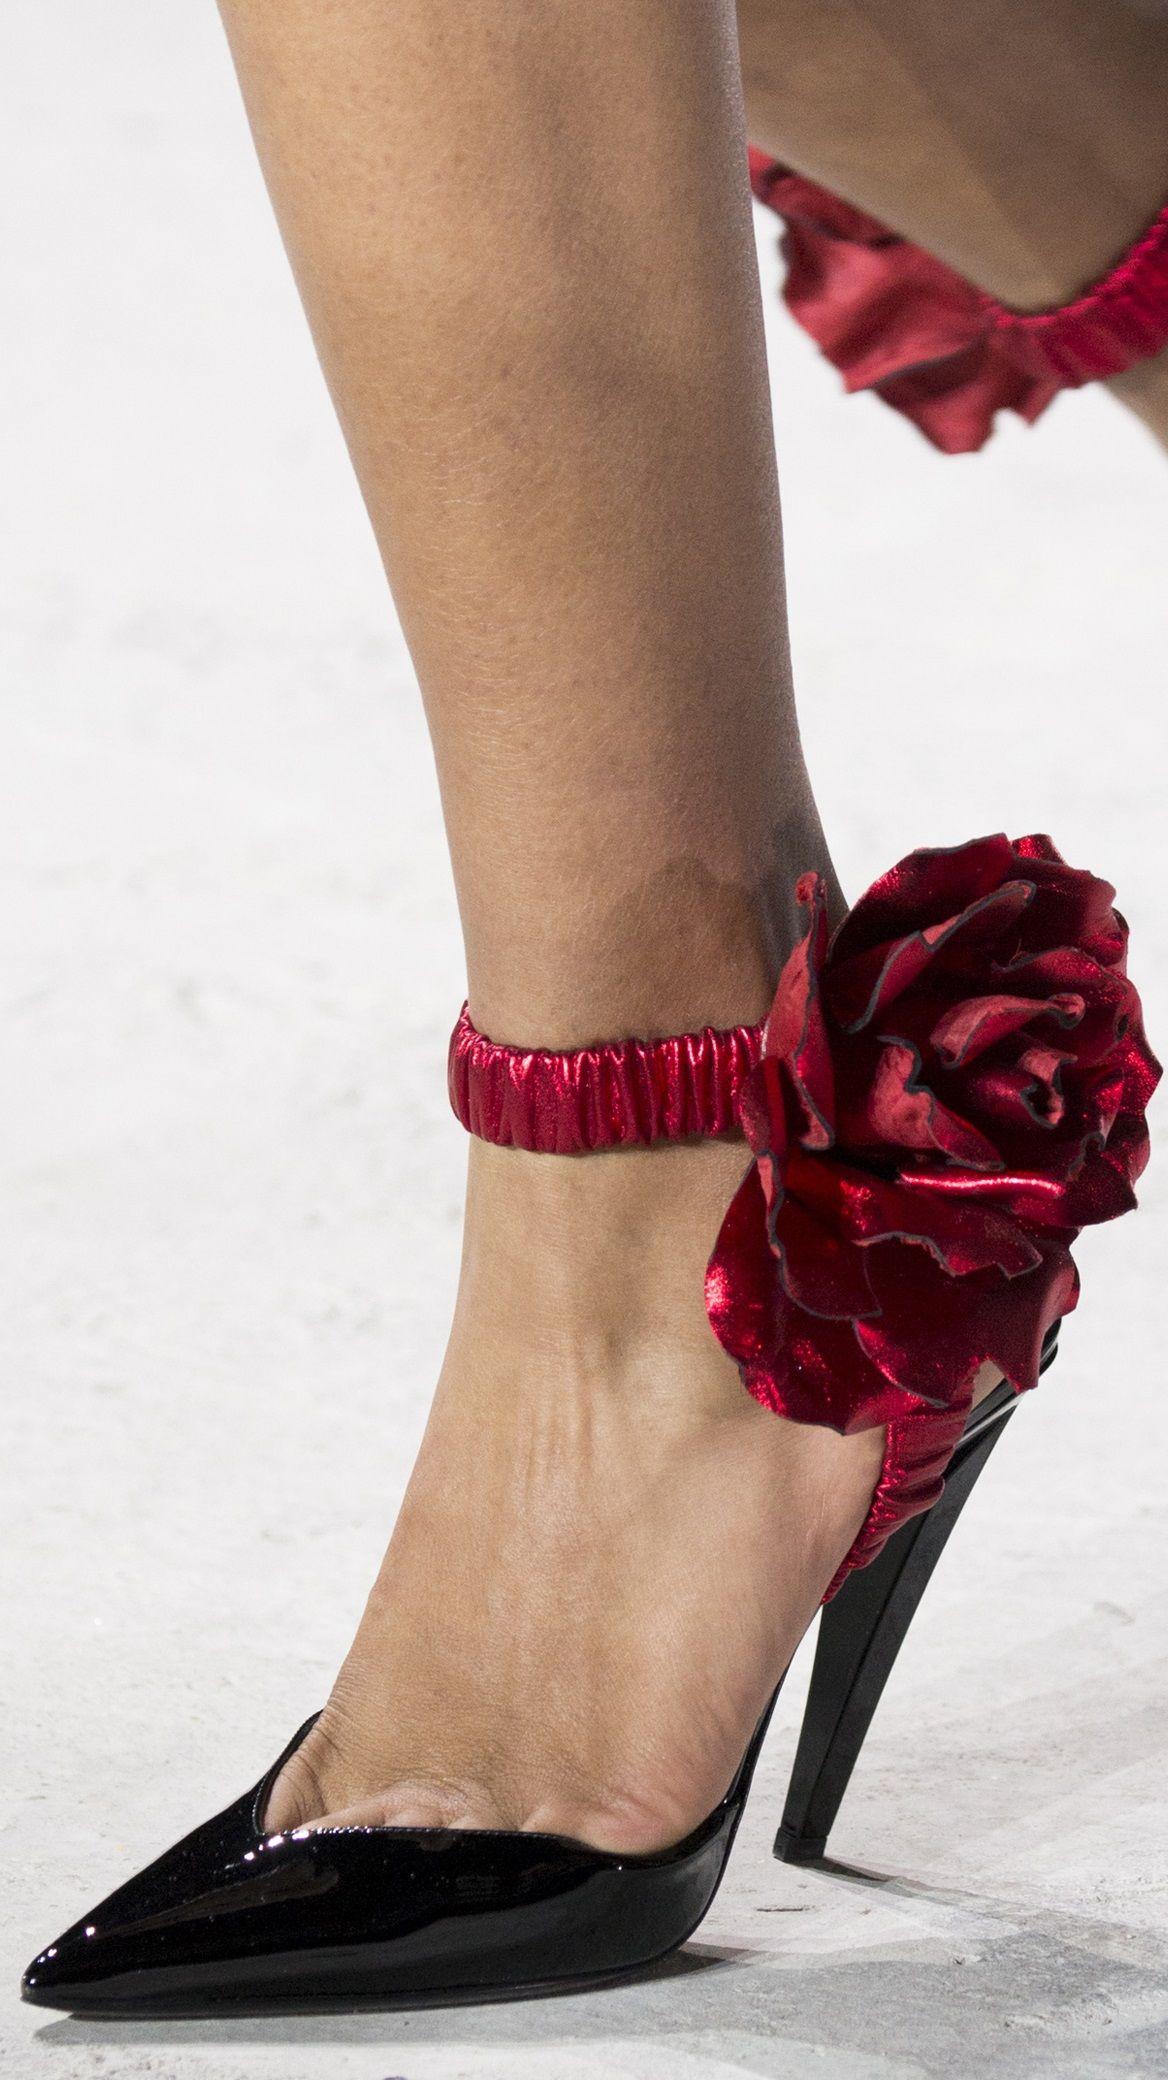 Great toe cleavage!  Saint Laurent FW 2017